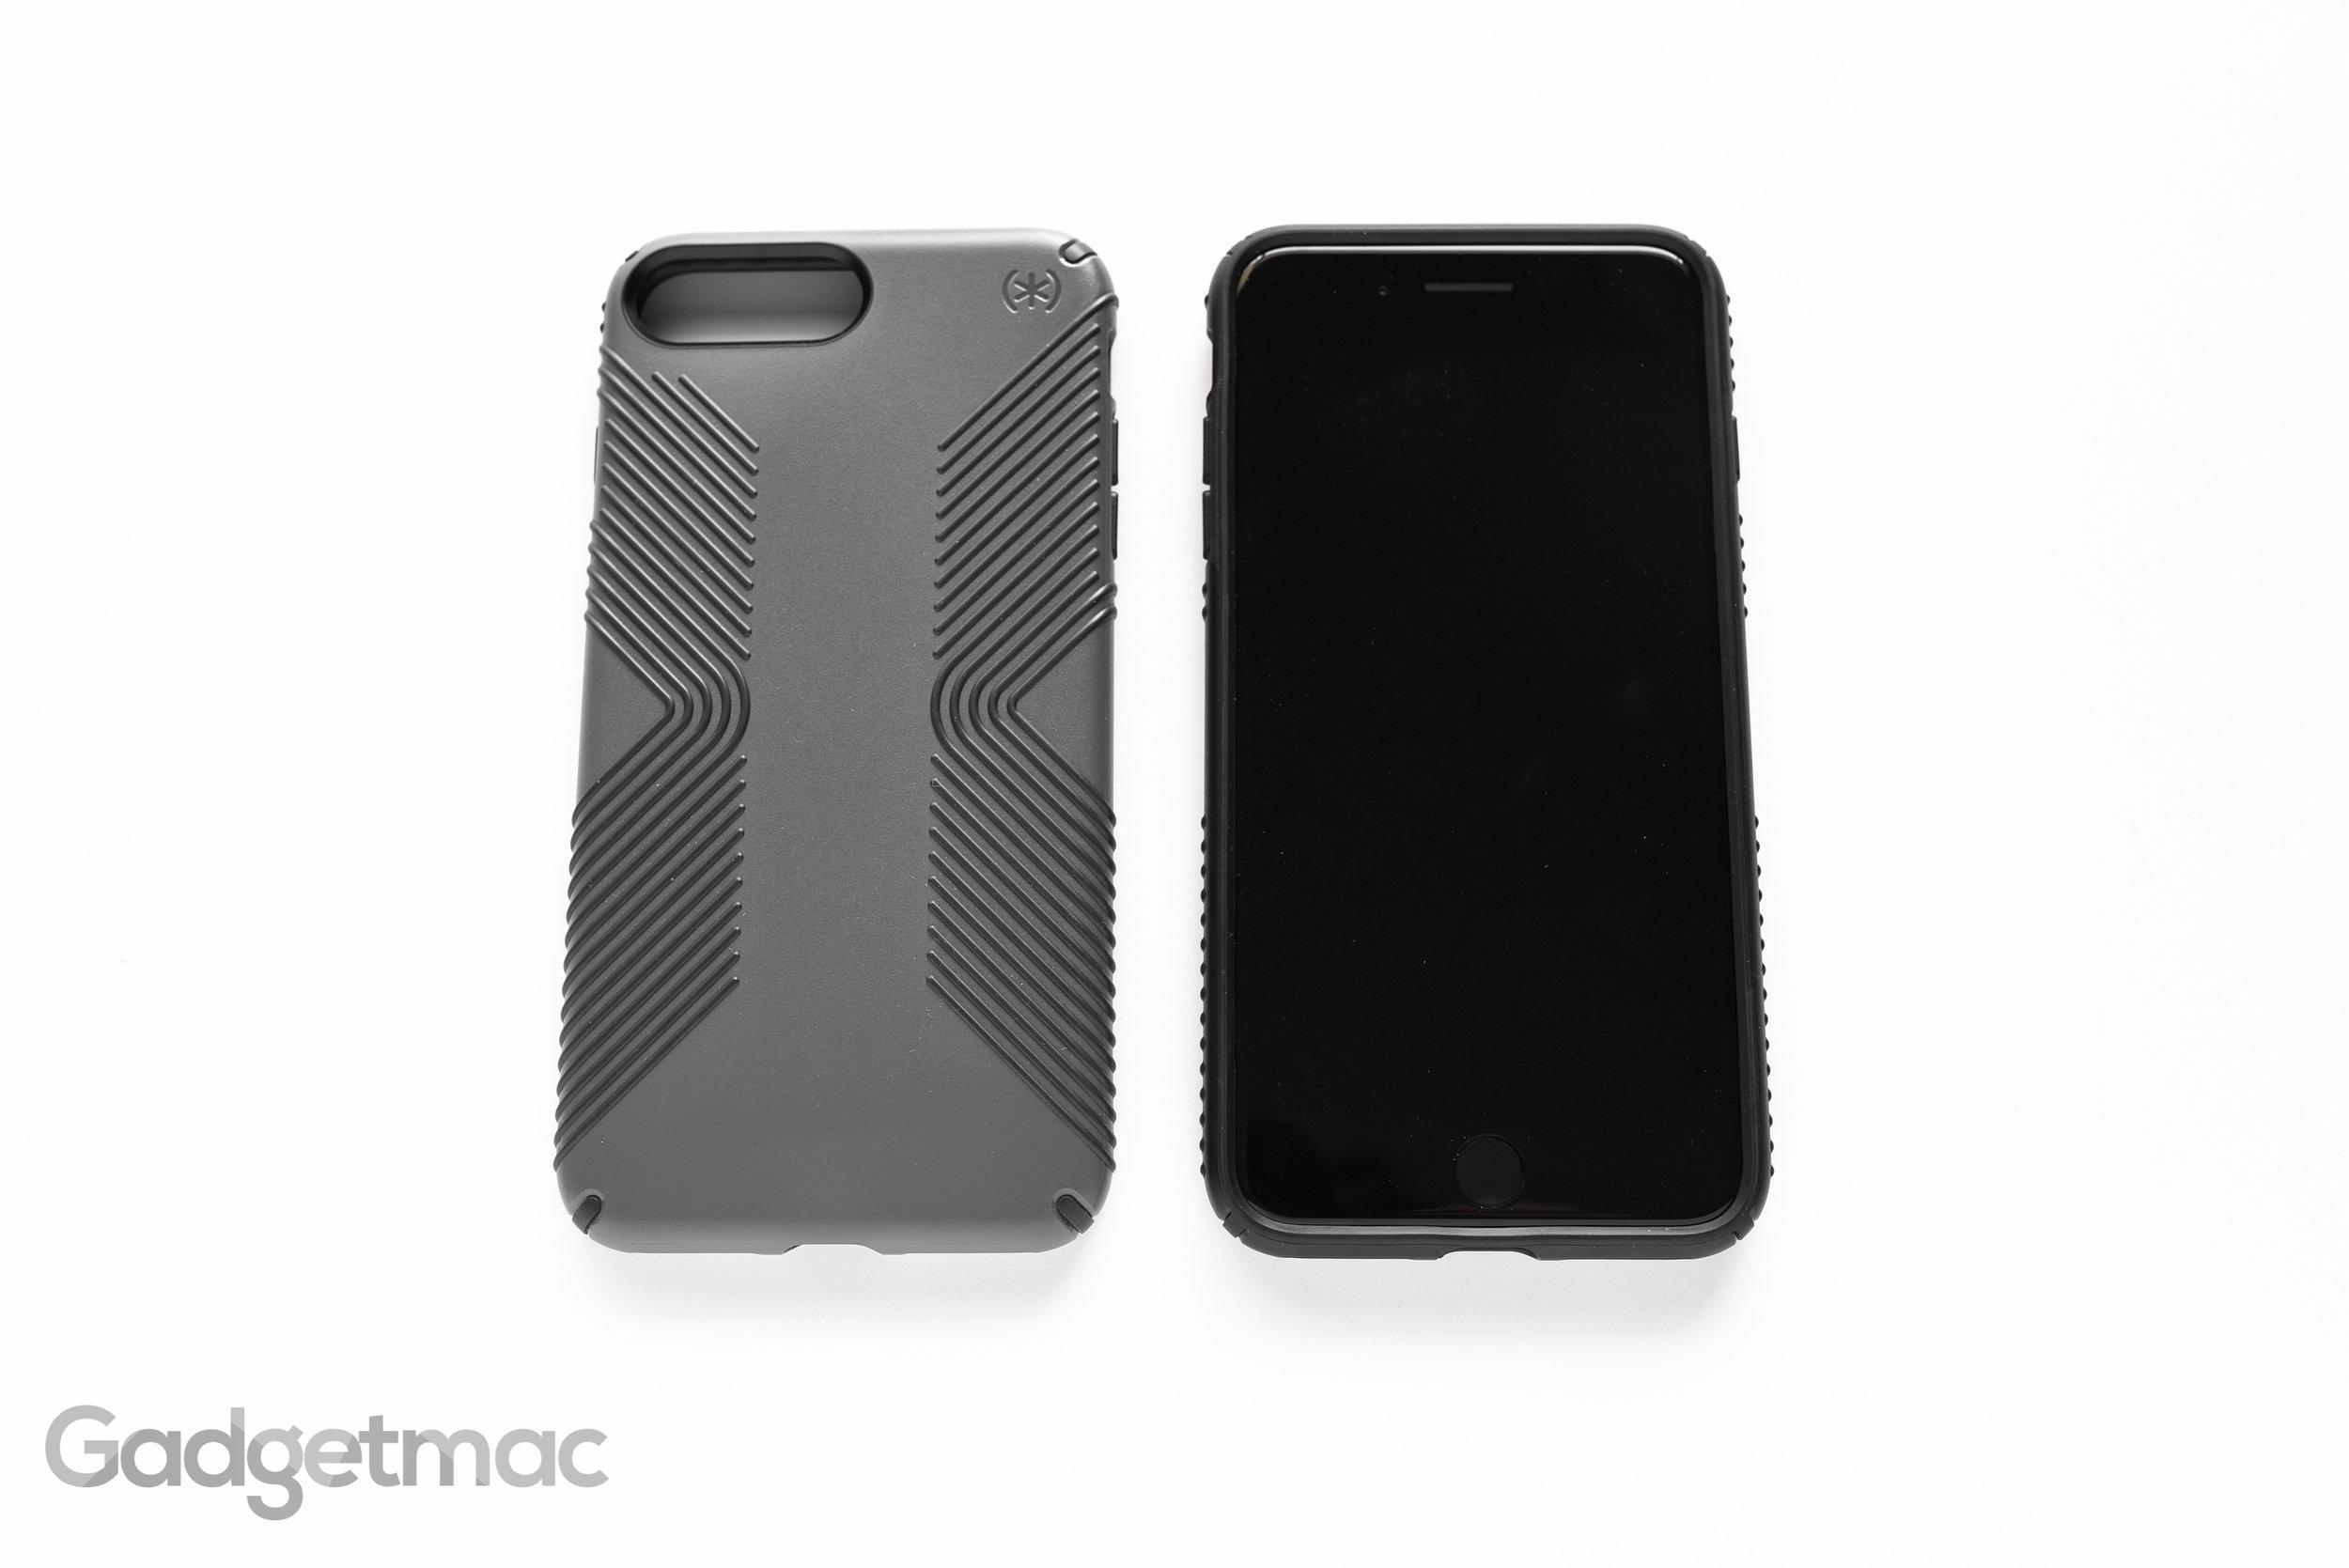 speck-presidio-grip-iphone-7-plus-case-front.jpg